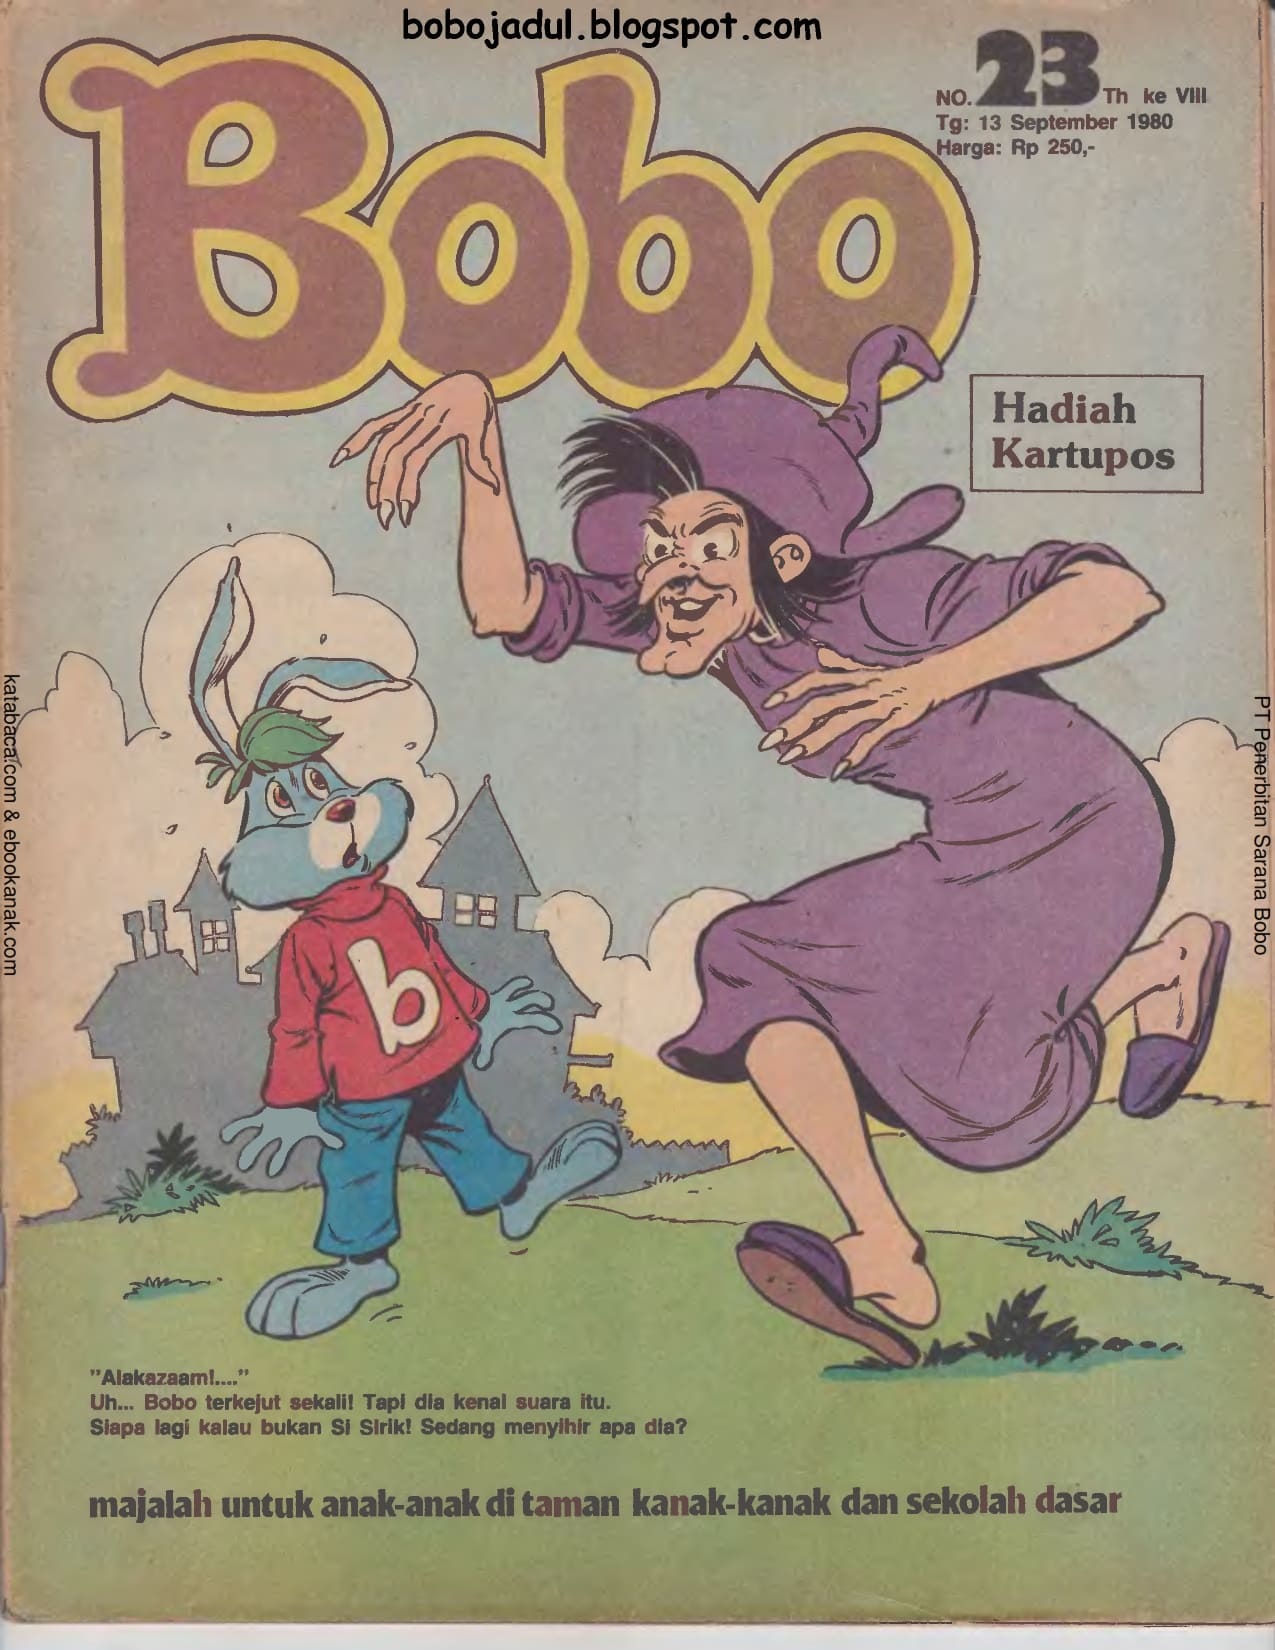 Baca Online Majalah Bobo Jadul, 13 September 1980_001